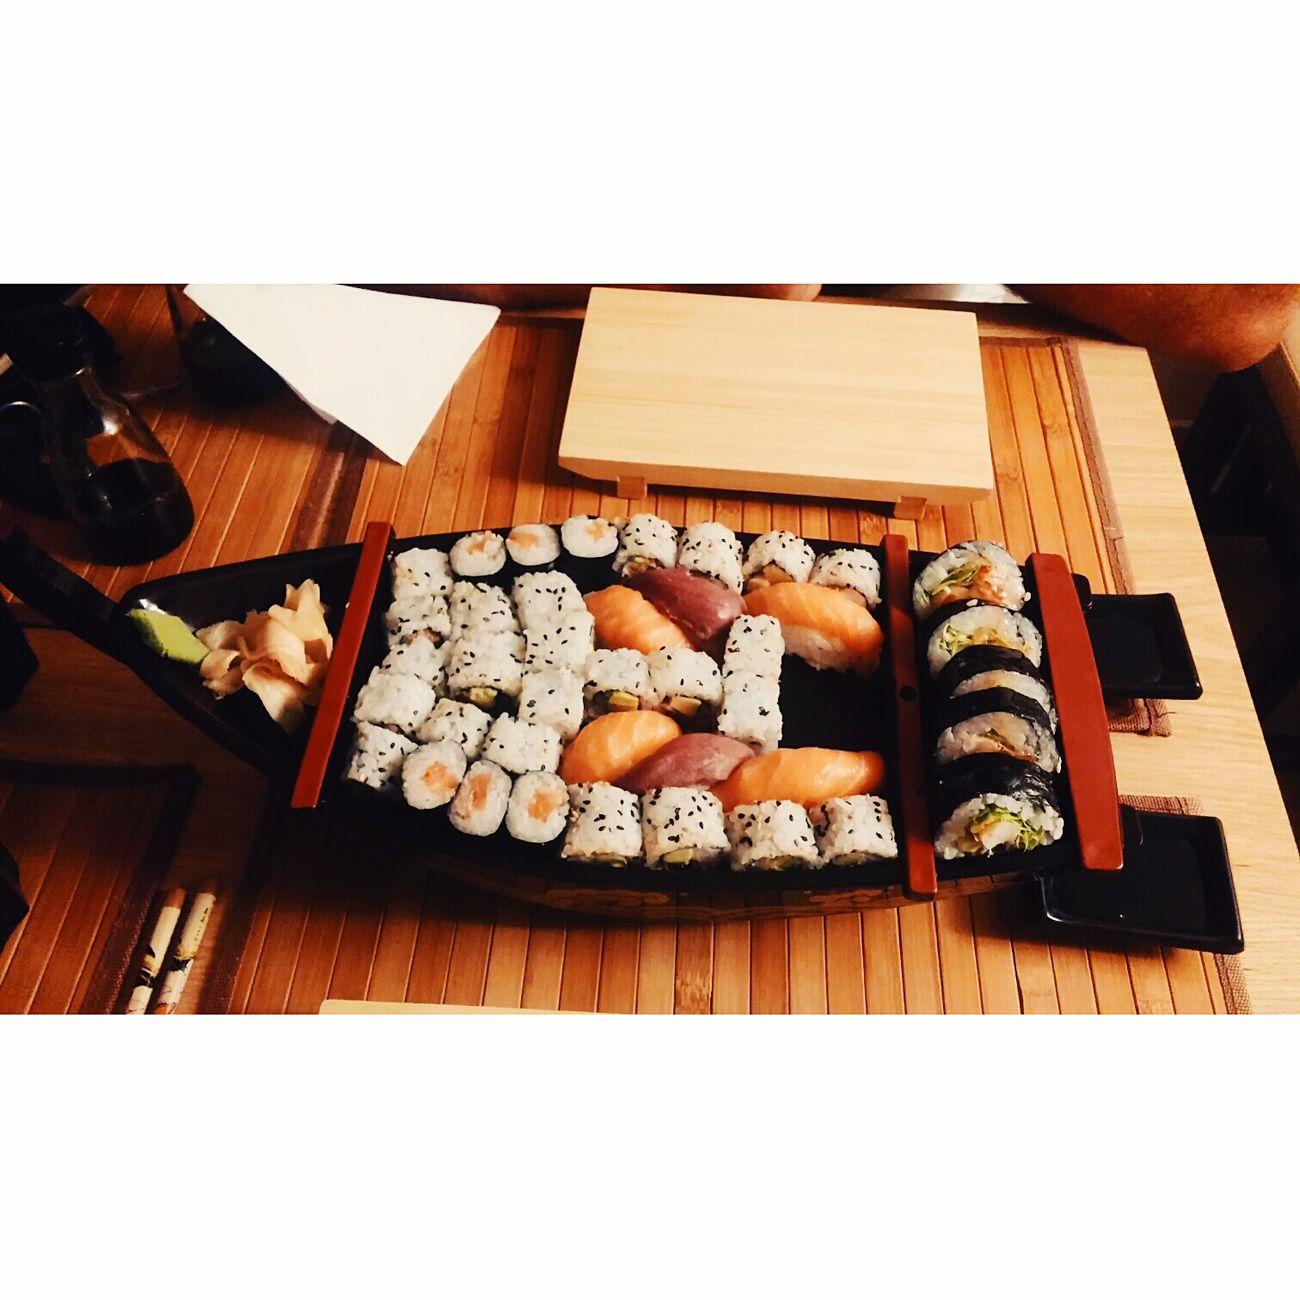 Sushi Sushis Sushilover Sushiaddict Eating Sushi SushiBar Sushiroll